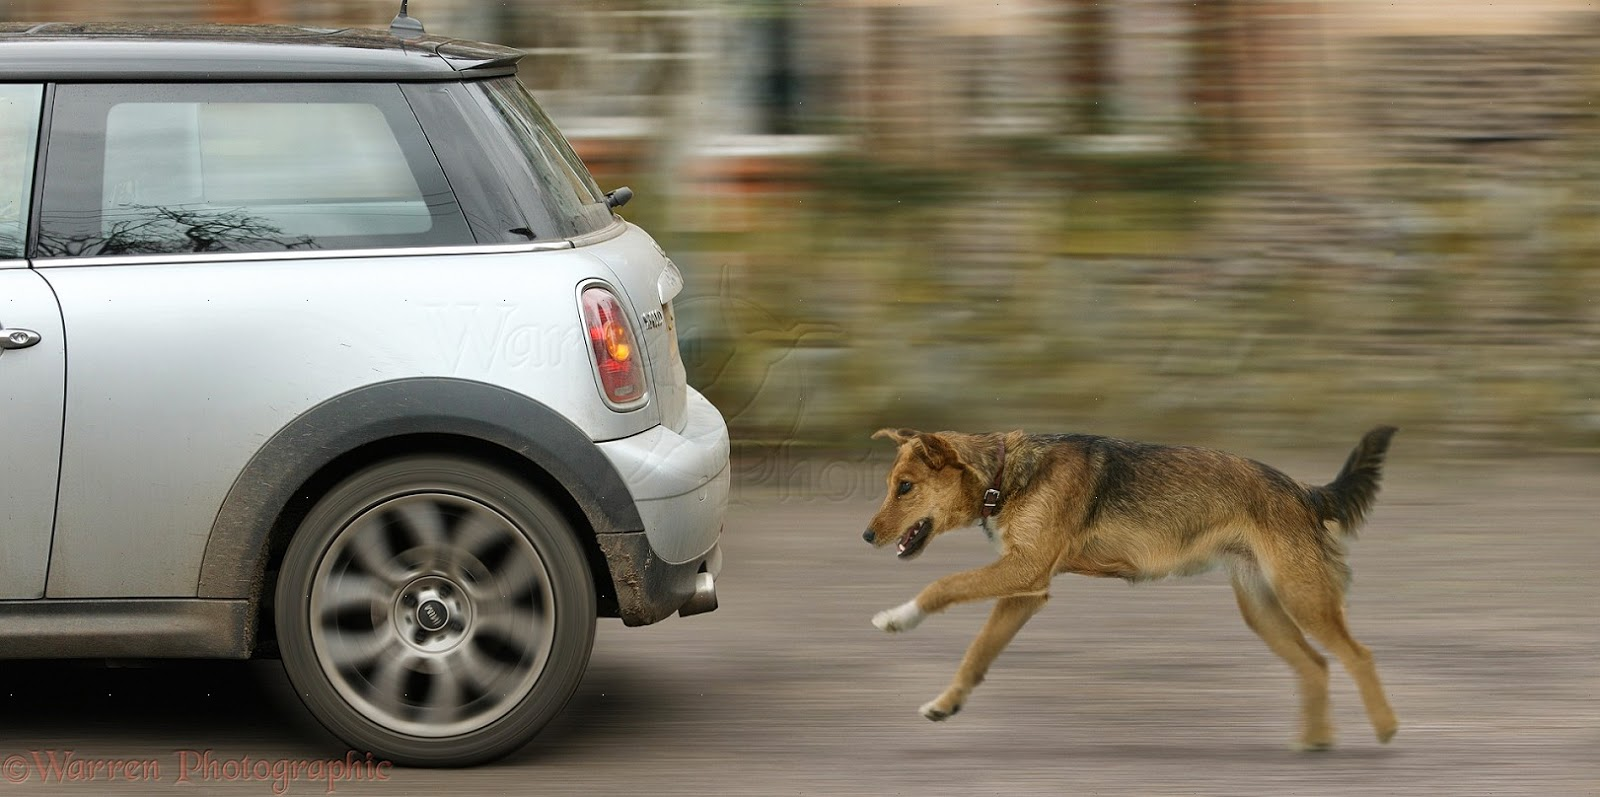 38035-Dog-chasing-a-car